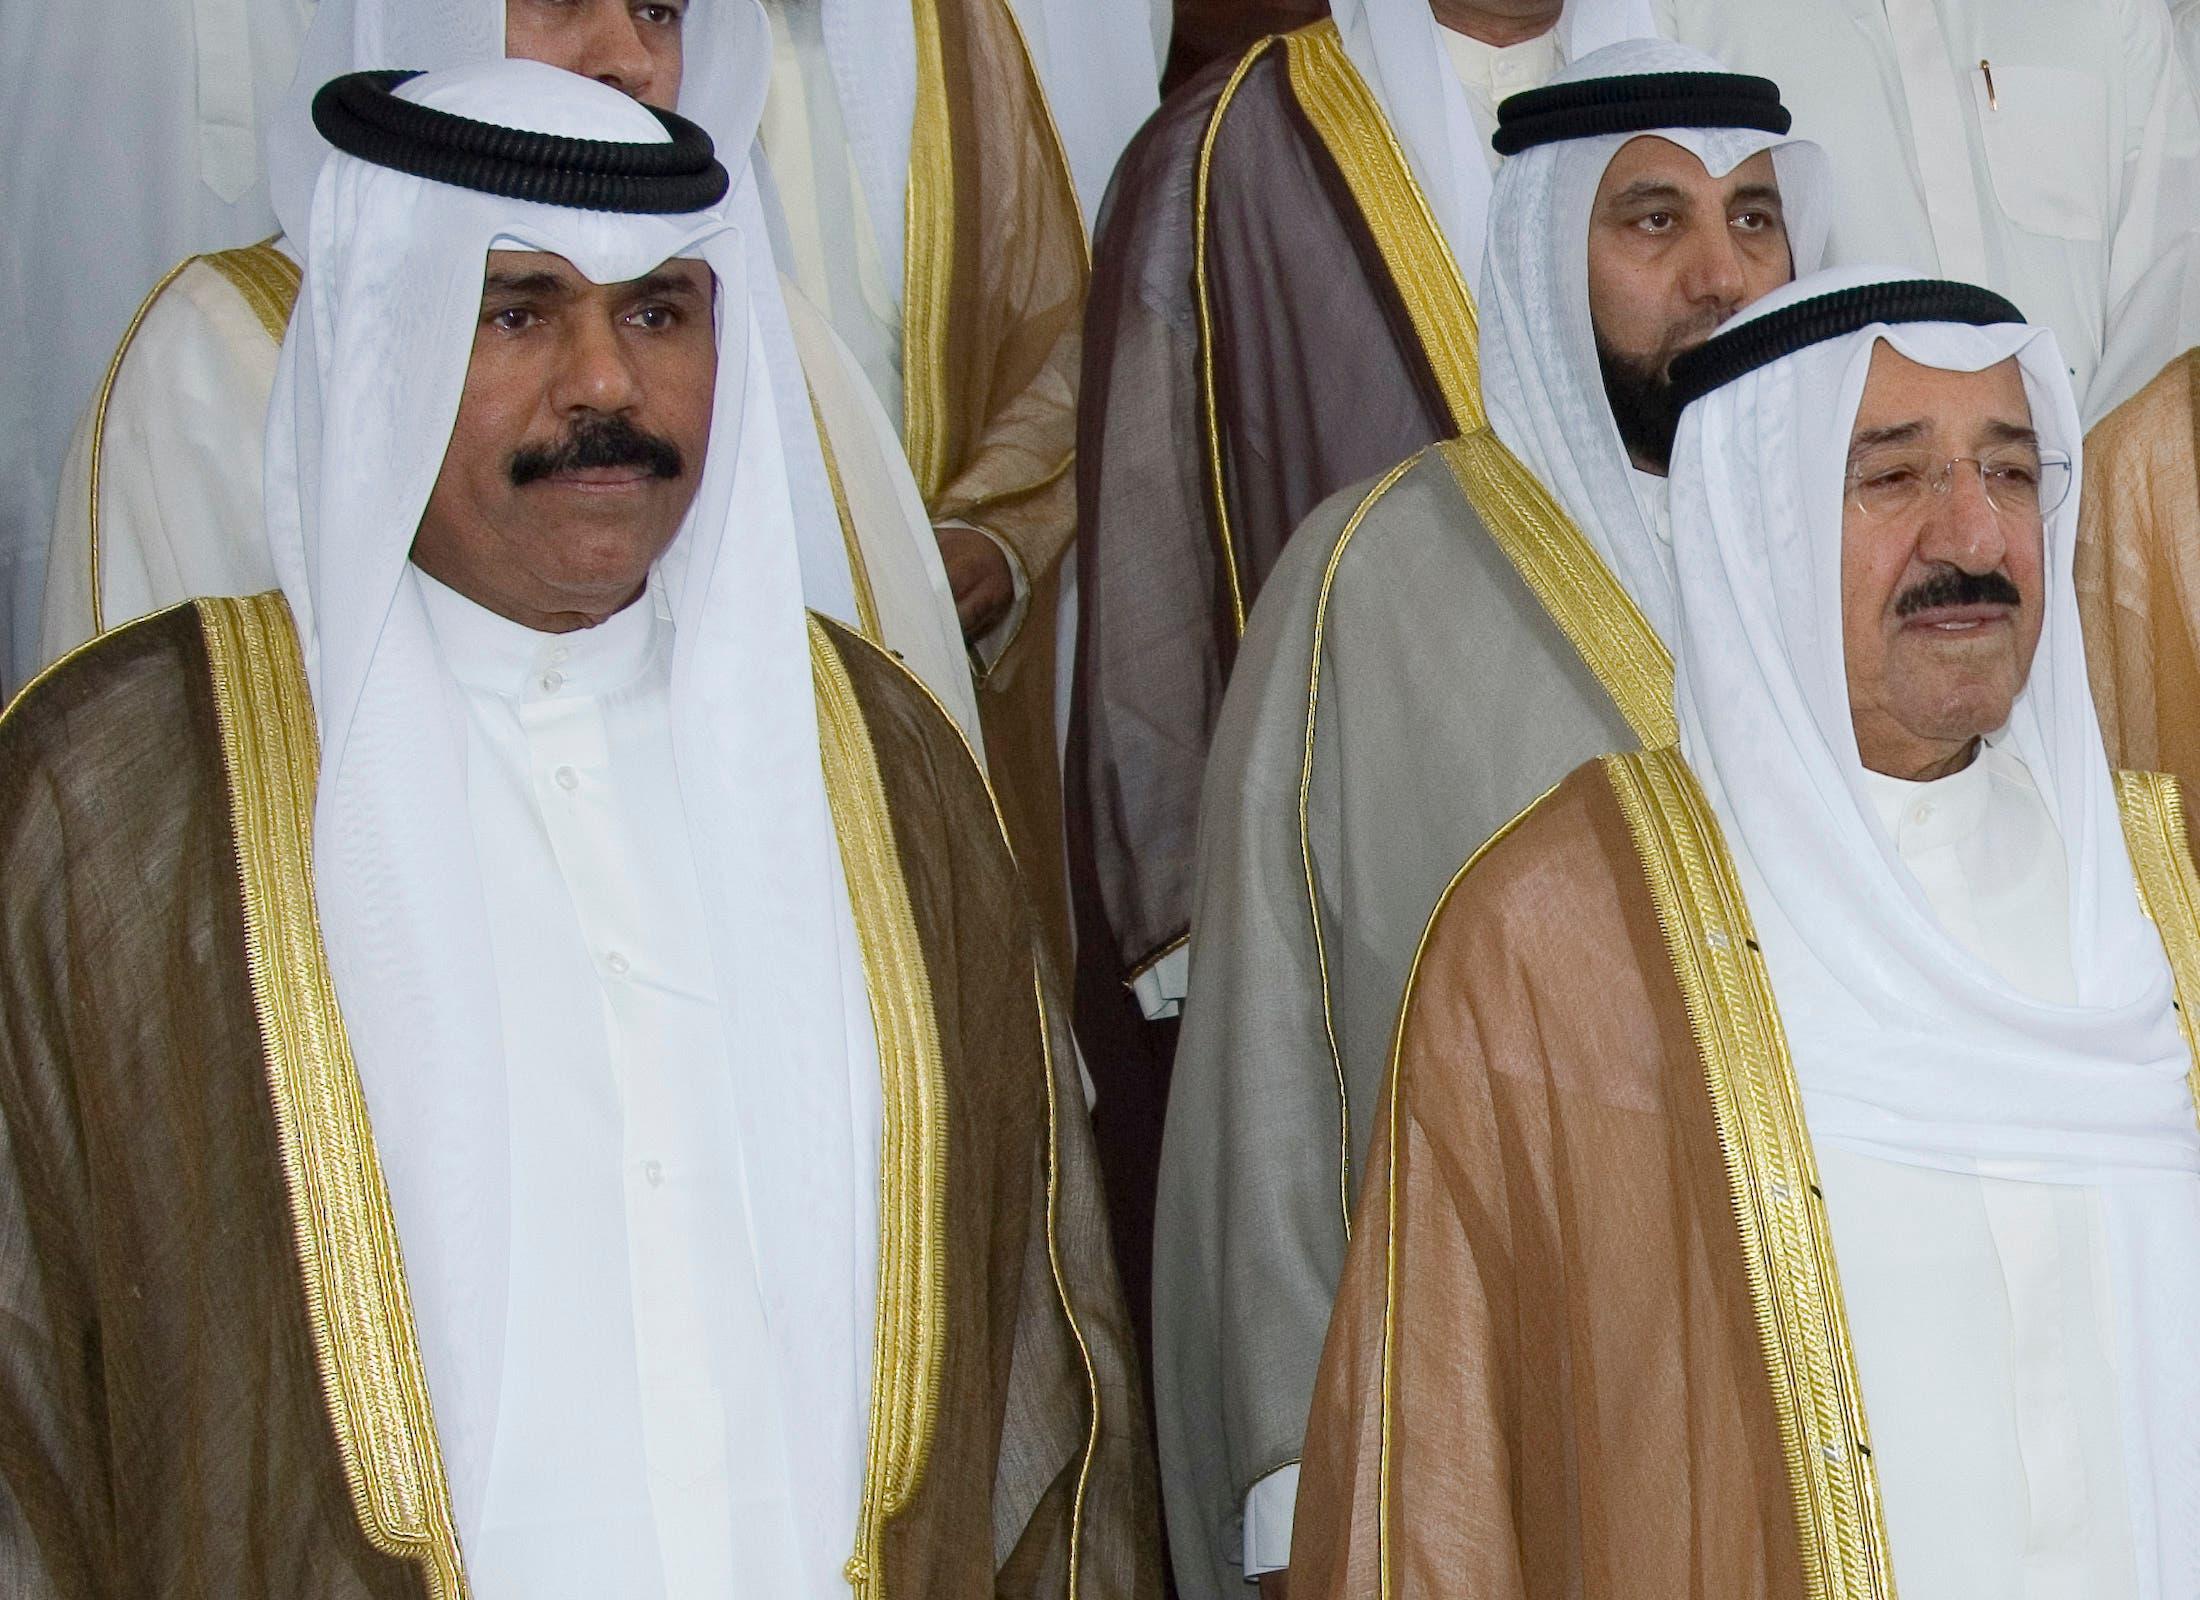 Kuwait's Emir Sheikh Sabah al-Ahmad Al-Sabah (R), Crown Prince Sheikh Nawaf al-Ahmad Al-Sabah (L) stand on the steps of the Parliament building October 30, 2006. (Reuters)